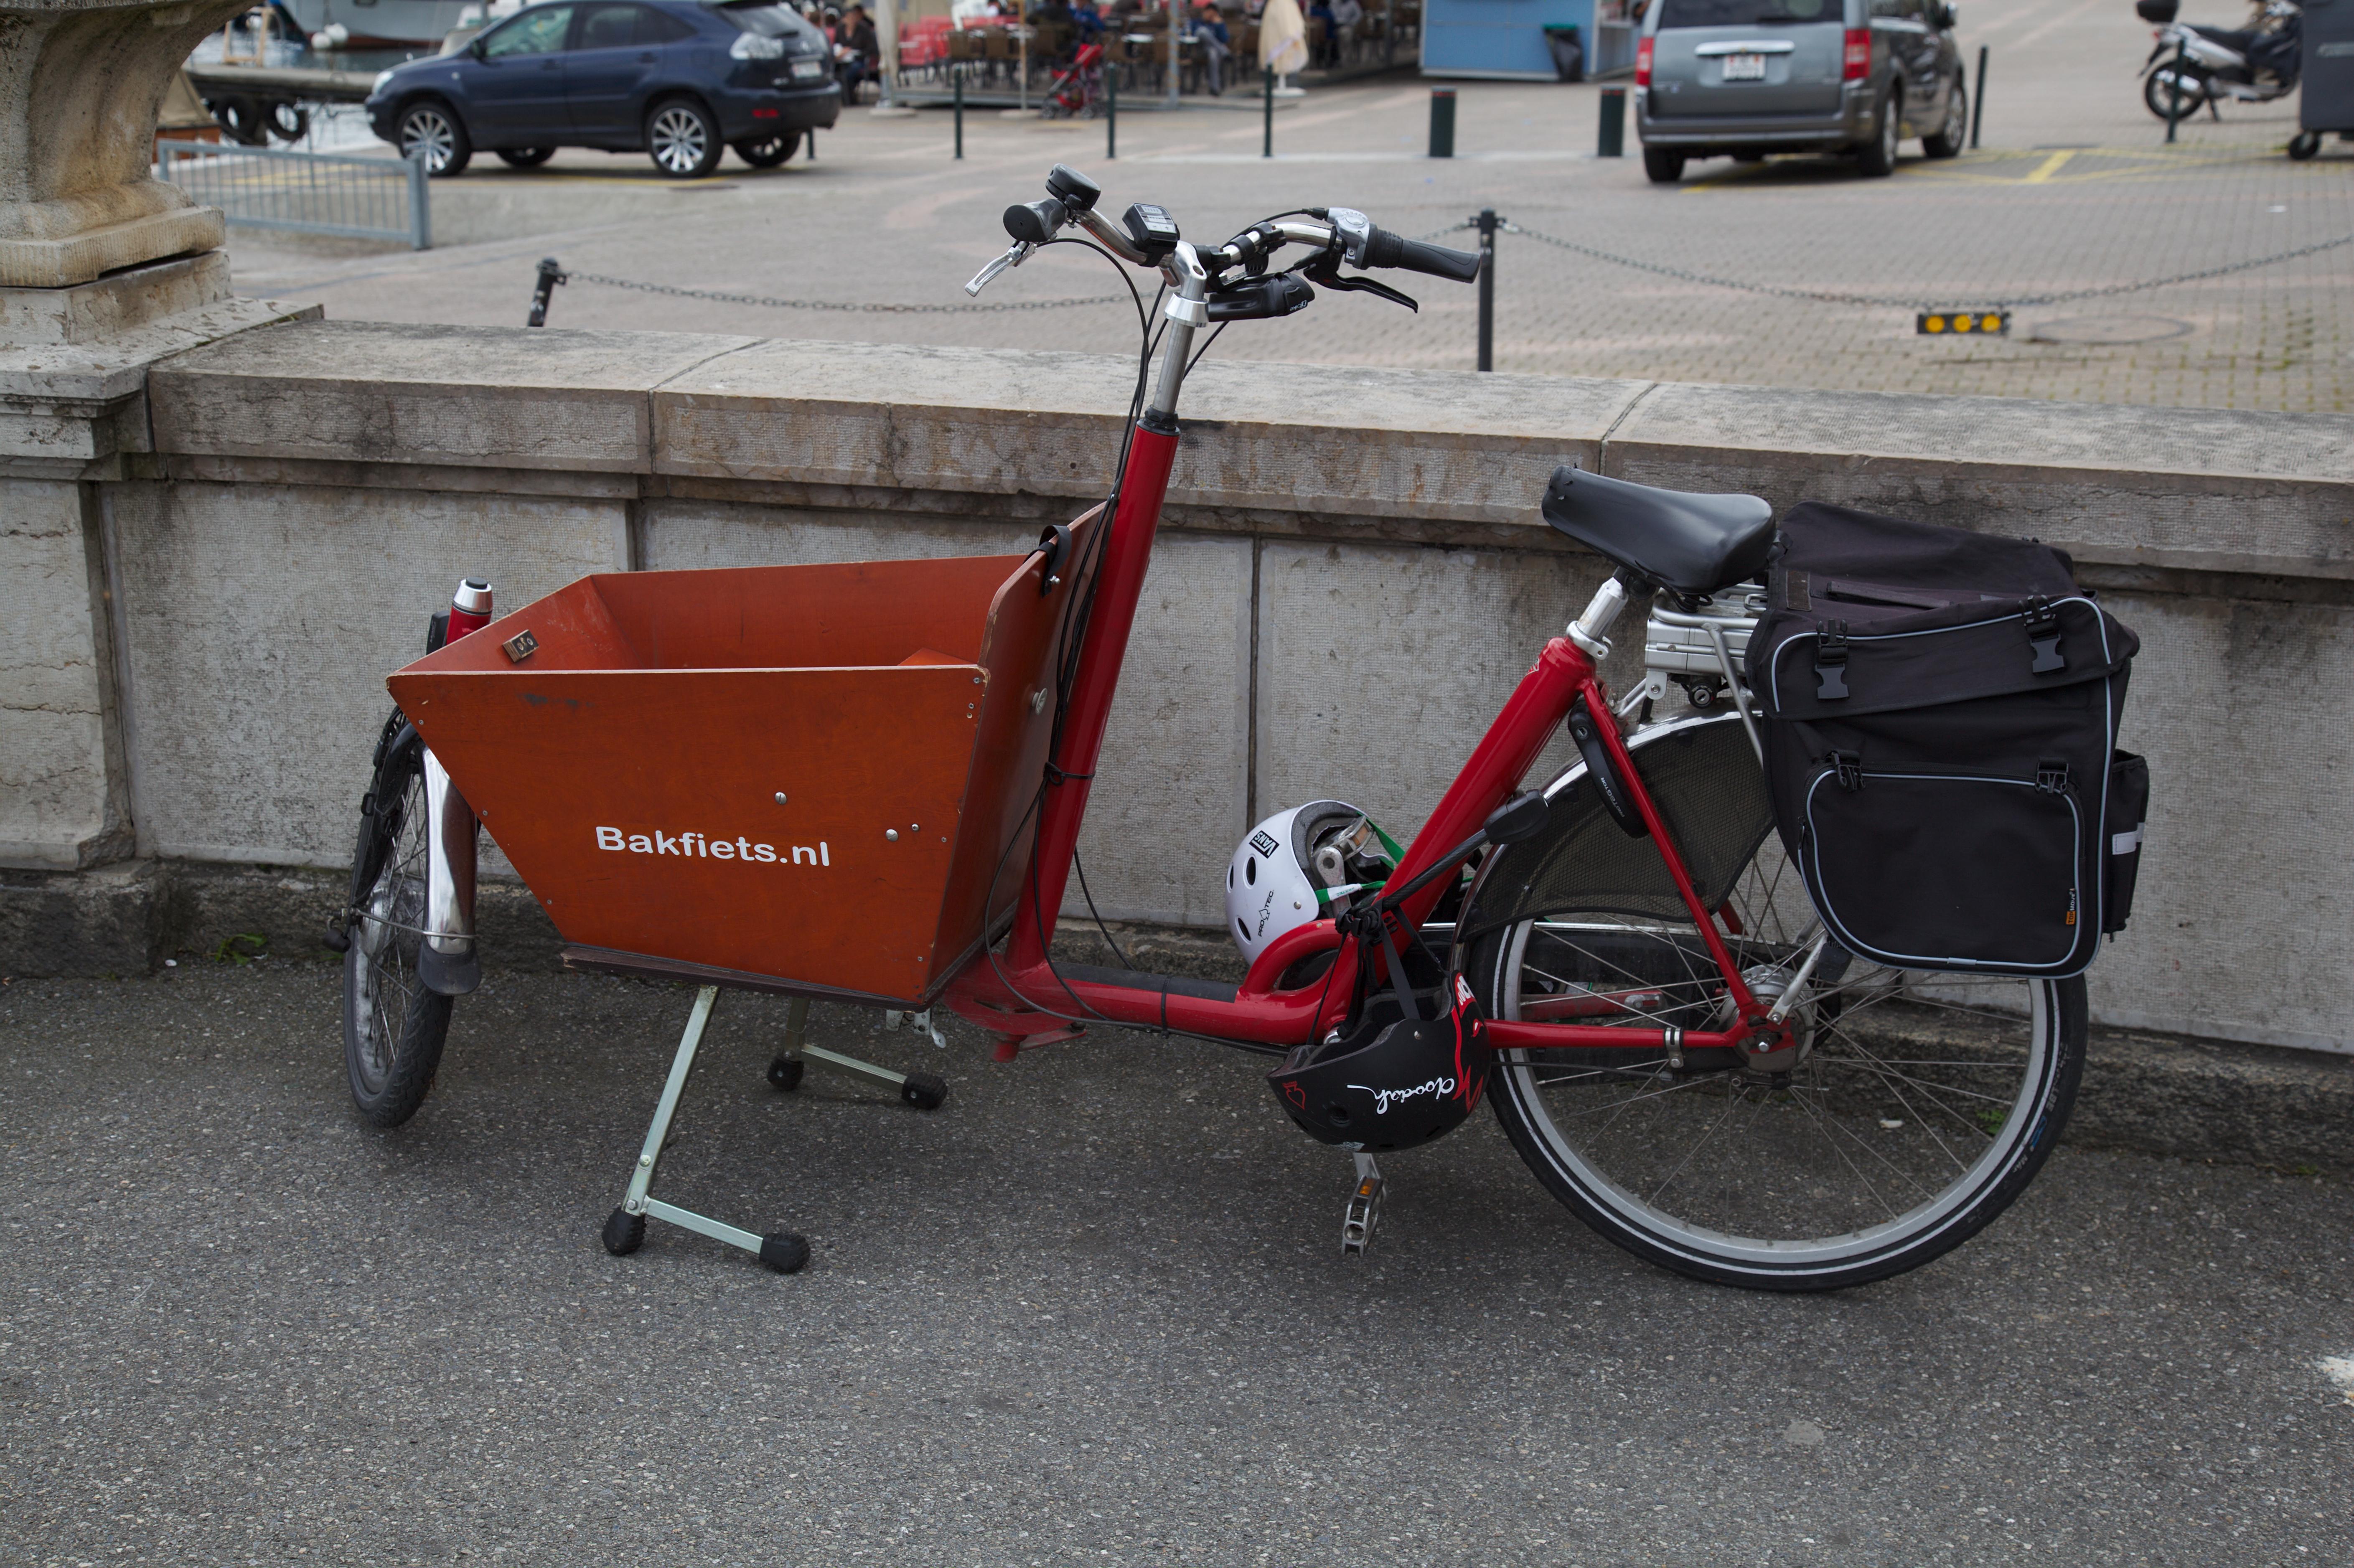 Onwijs Bakfiets.nl Electric Cargobike short in Geneva - BikeCamper MT-44